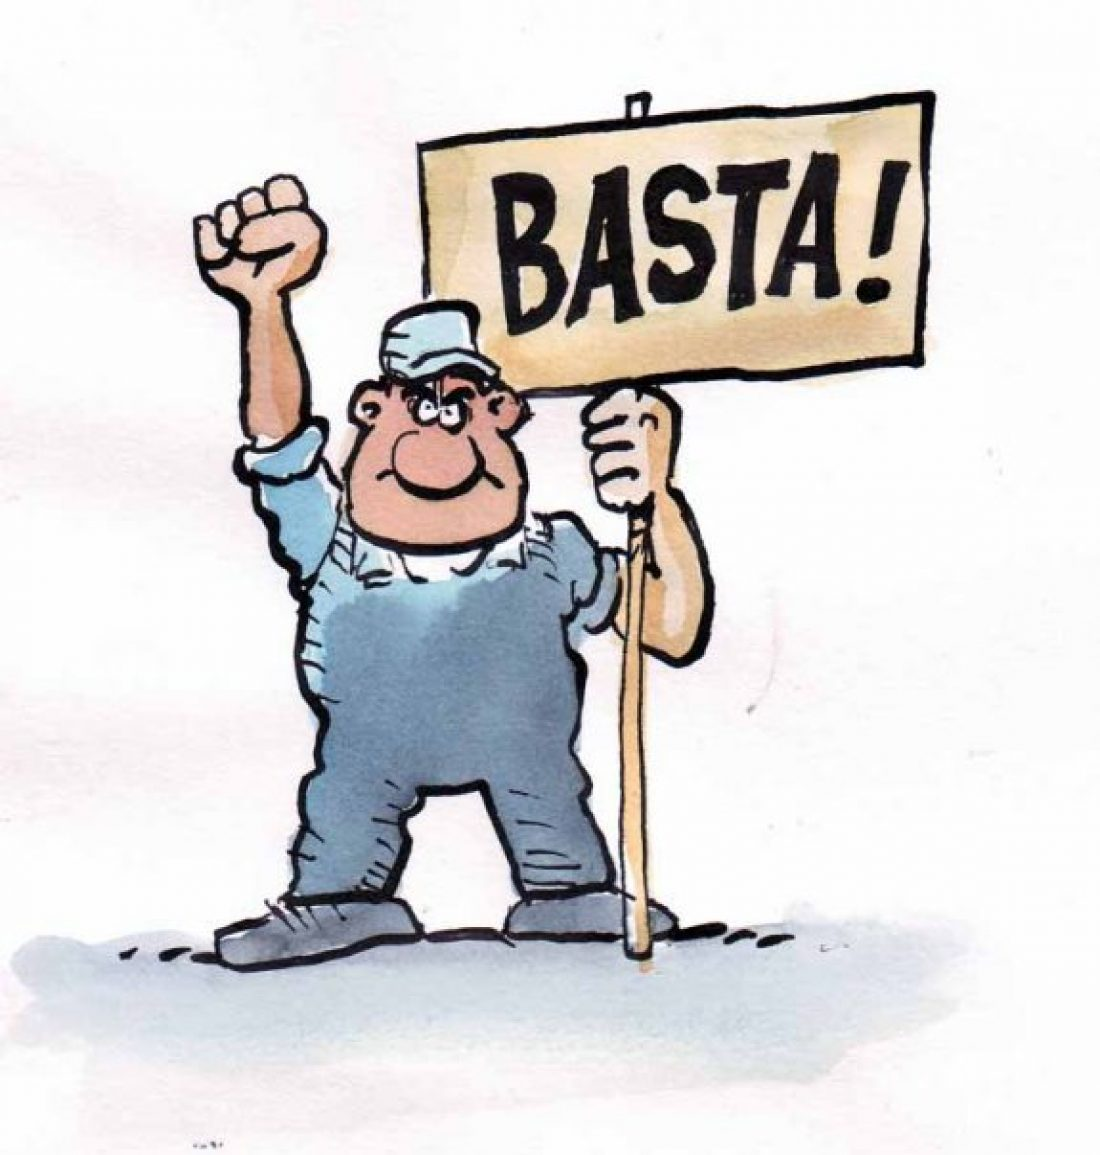 Valencia jueves 26 de julio. Manifestación de apoyo a las luchas de EMT, RTVV, Teletech, Renfe